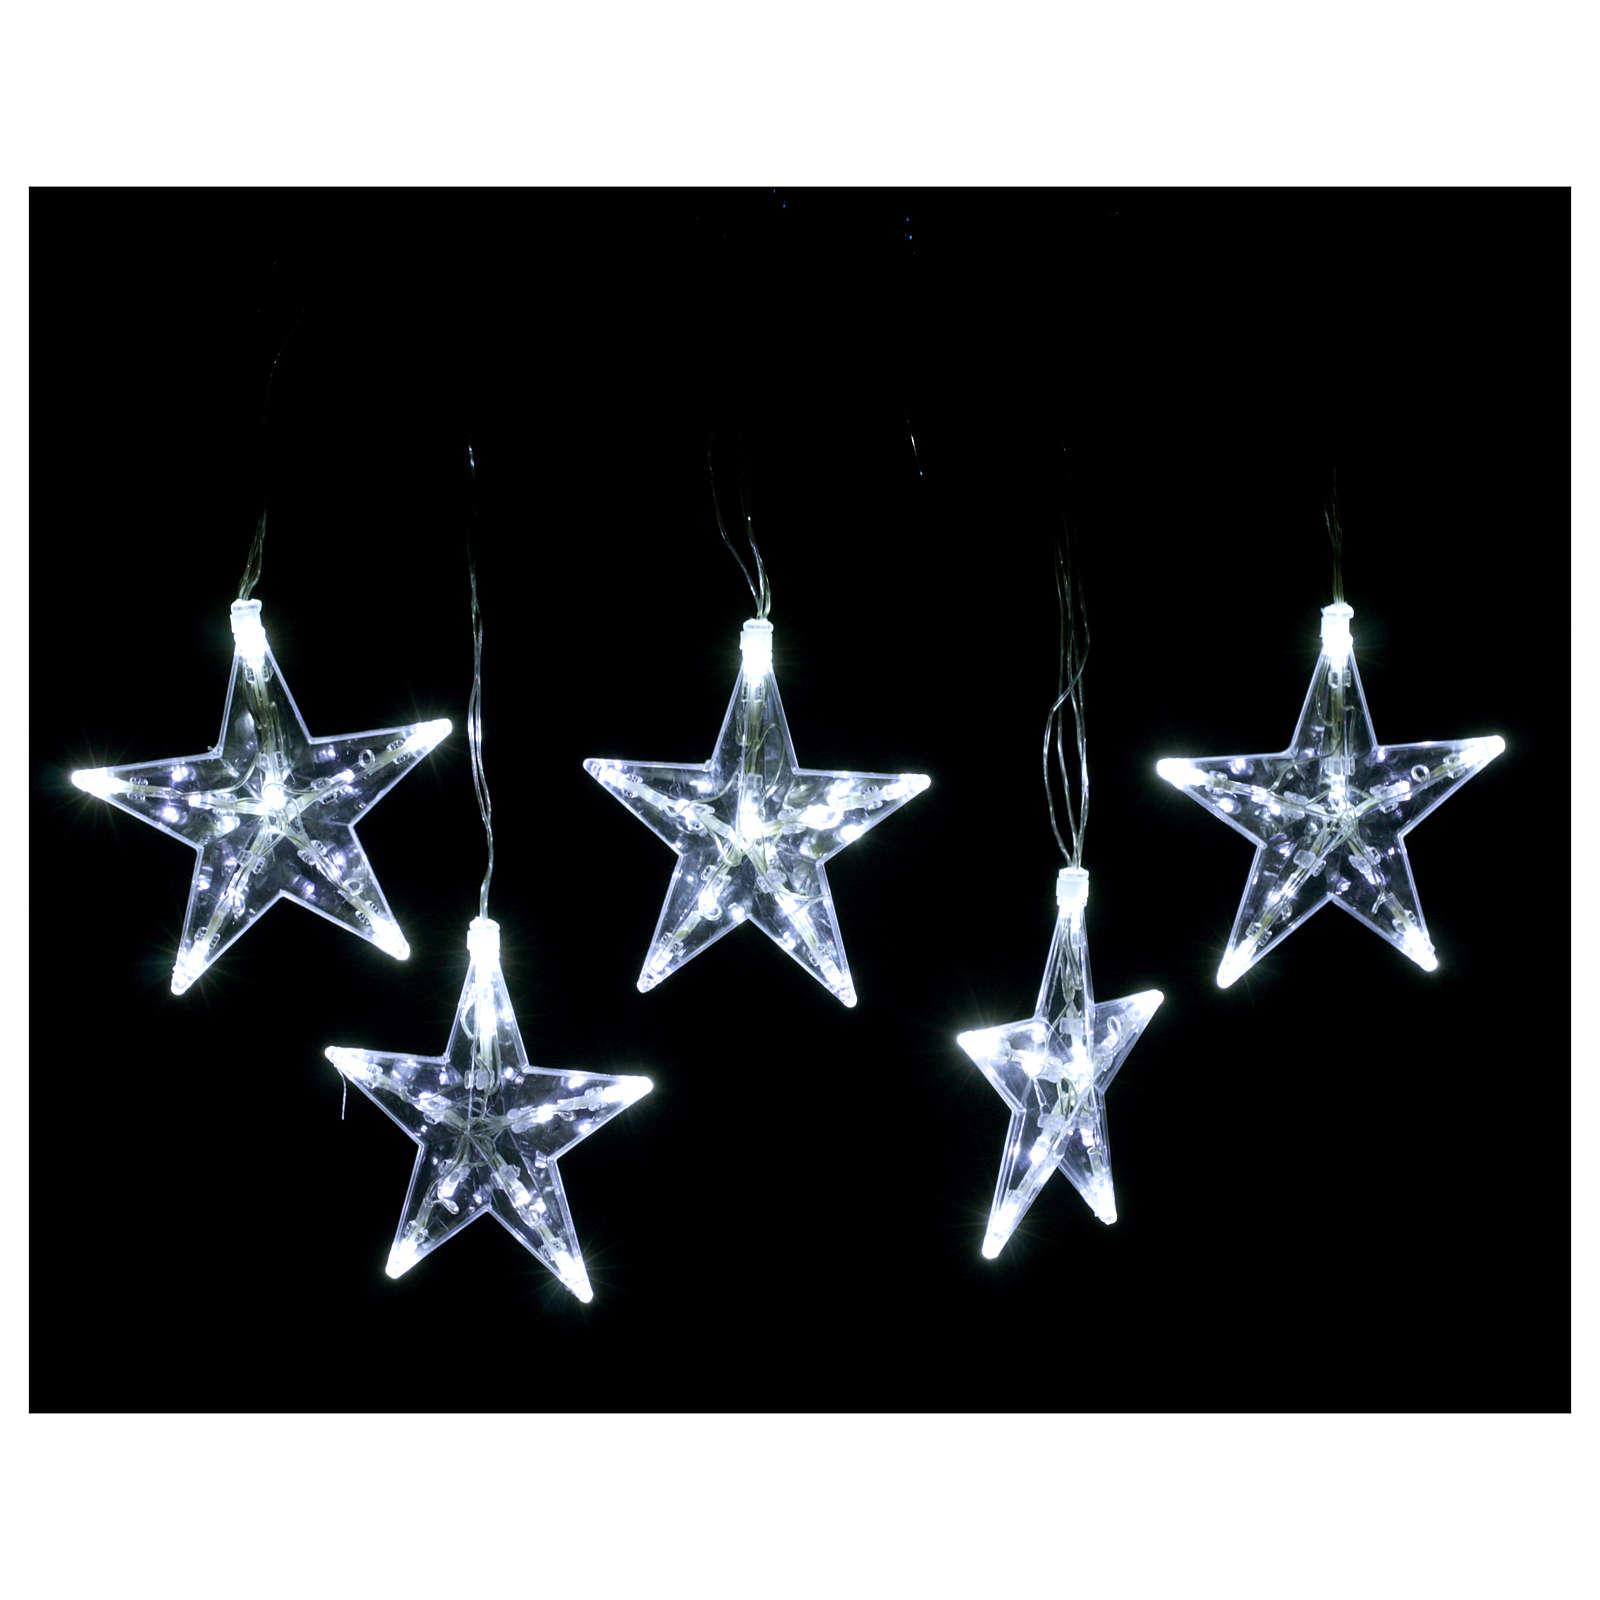 Luz navideña Estrellas 50 led blanco Hielo interior exterior 3